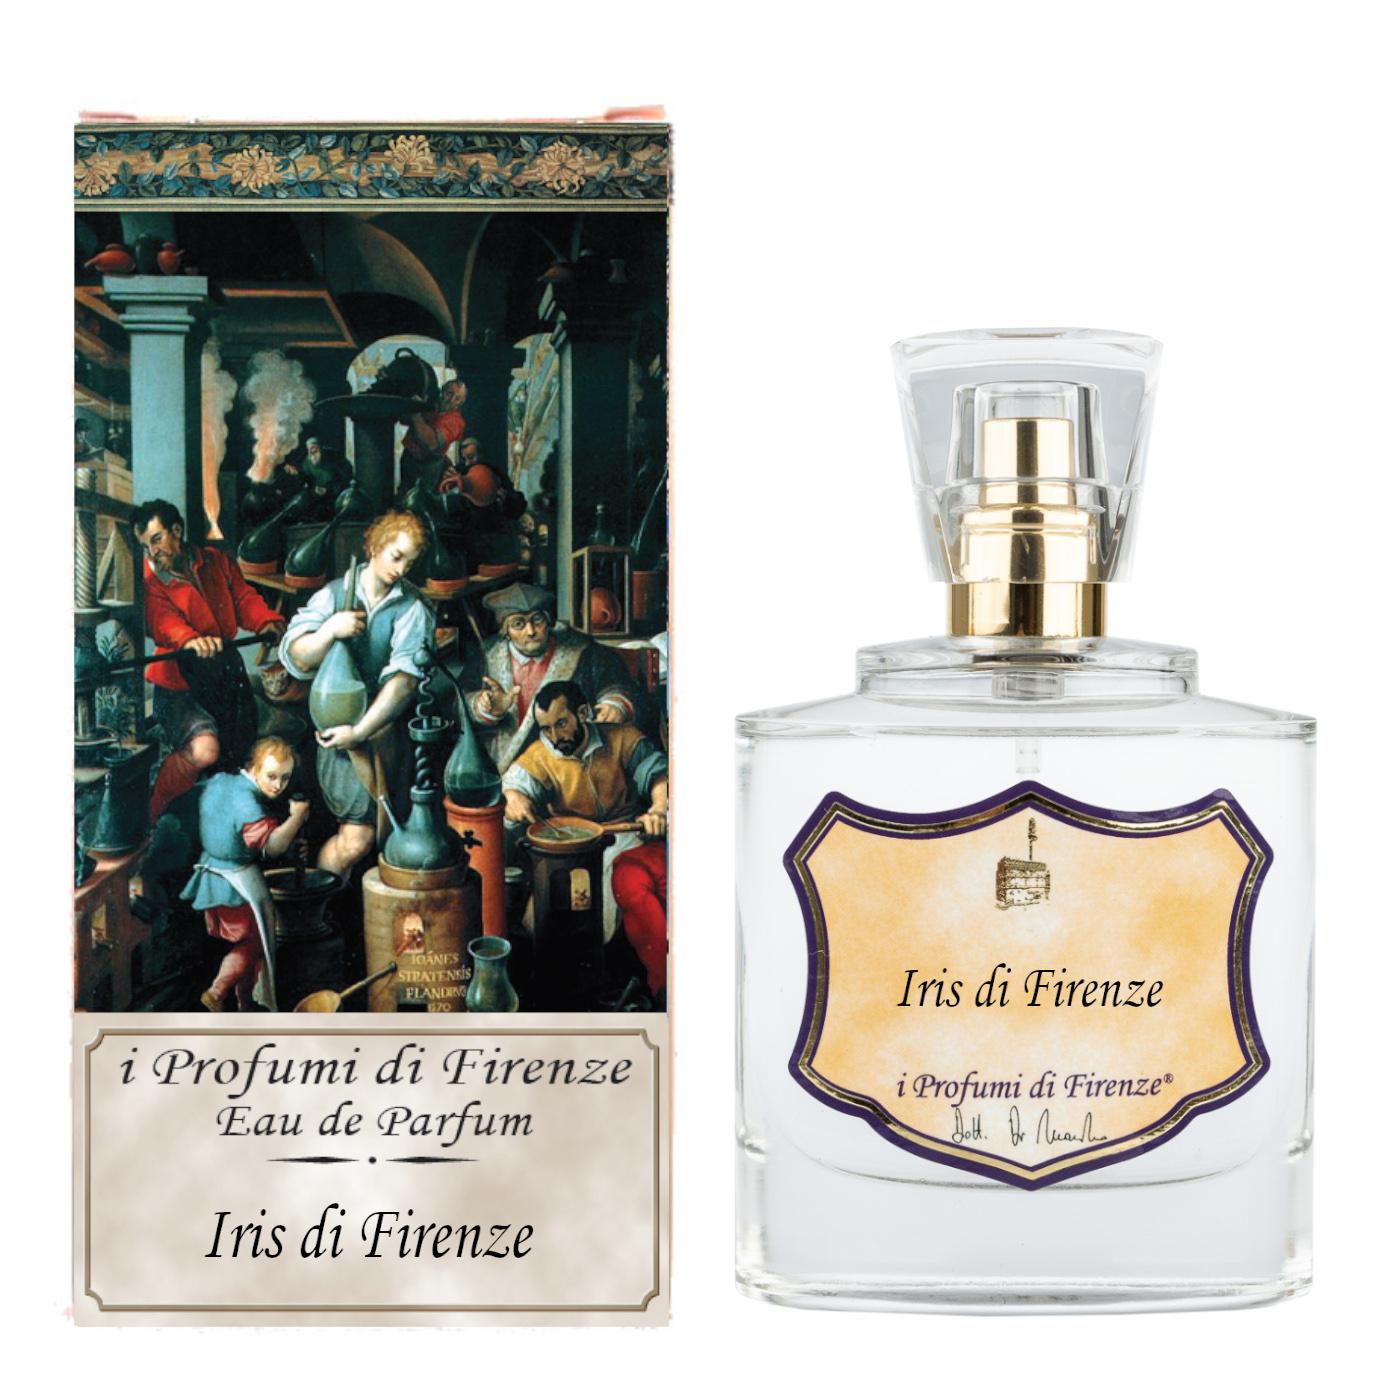 IRIS DI FIRENZE - Eau de Parfum-4157